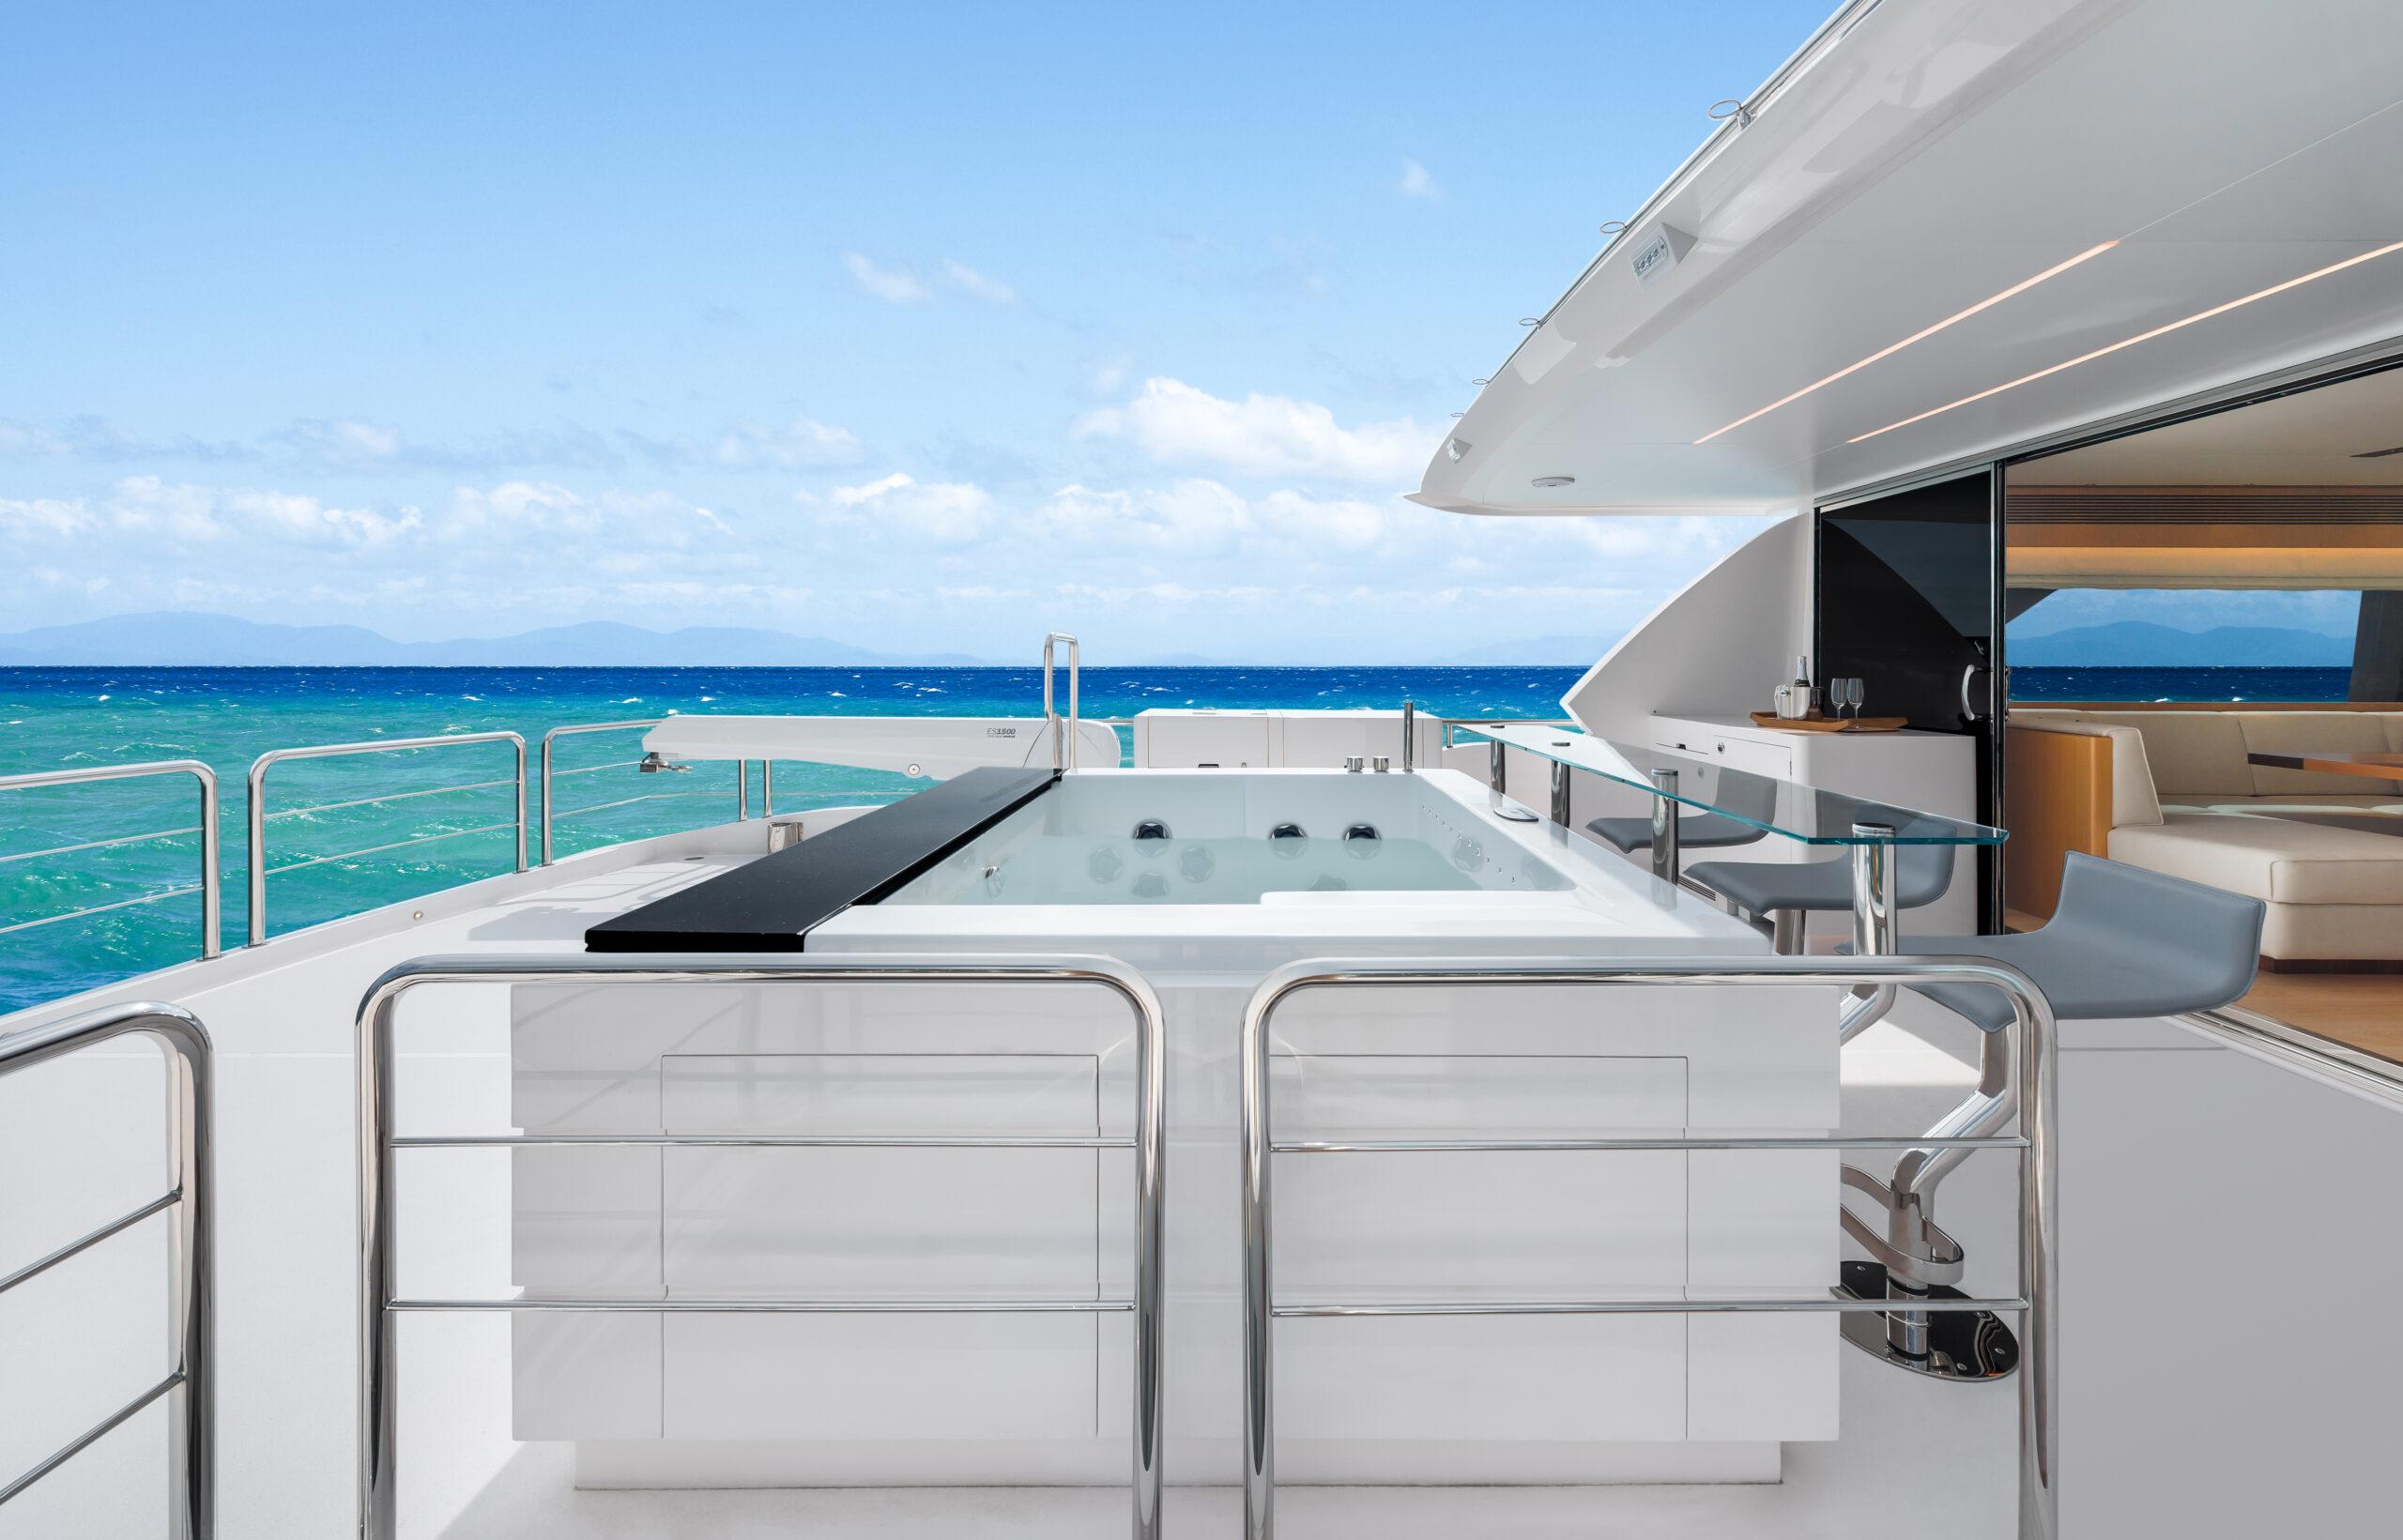 Hot tub on deck on the Horizon FD80